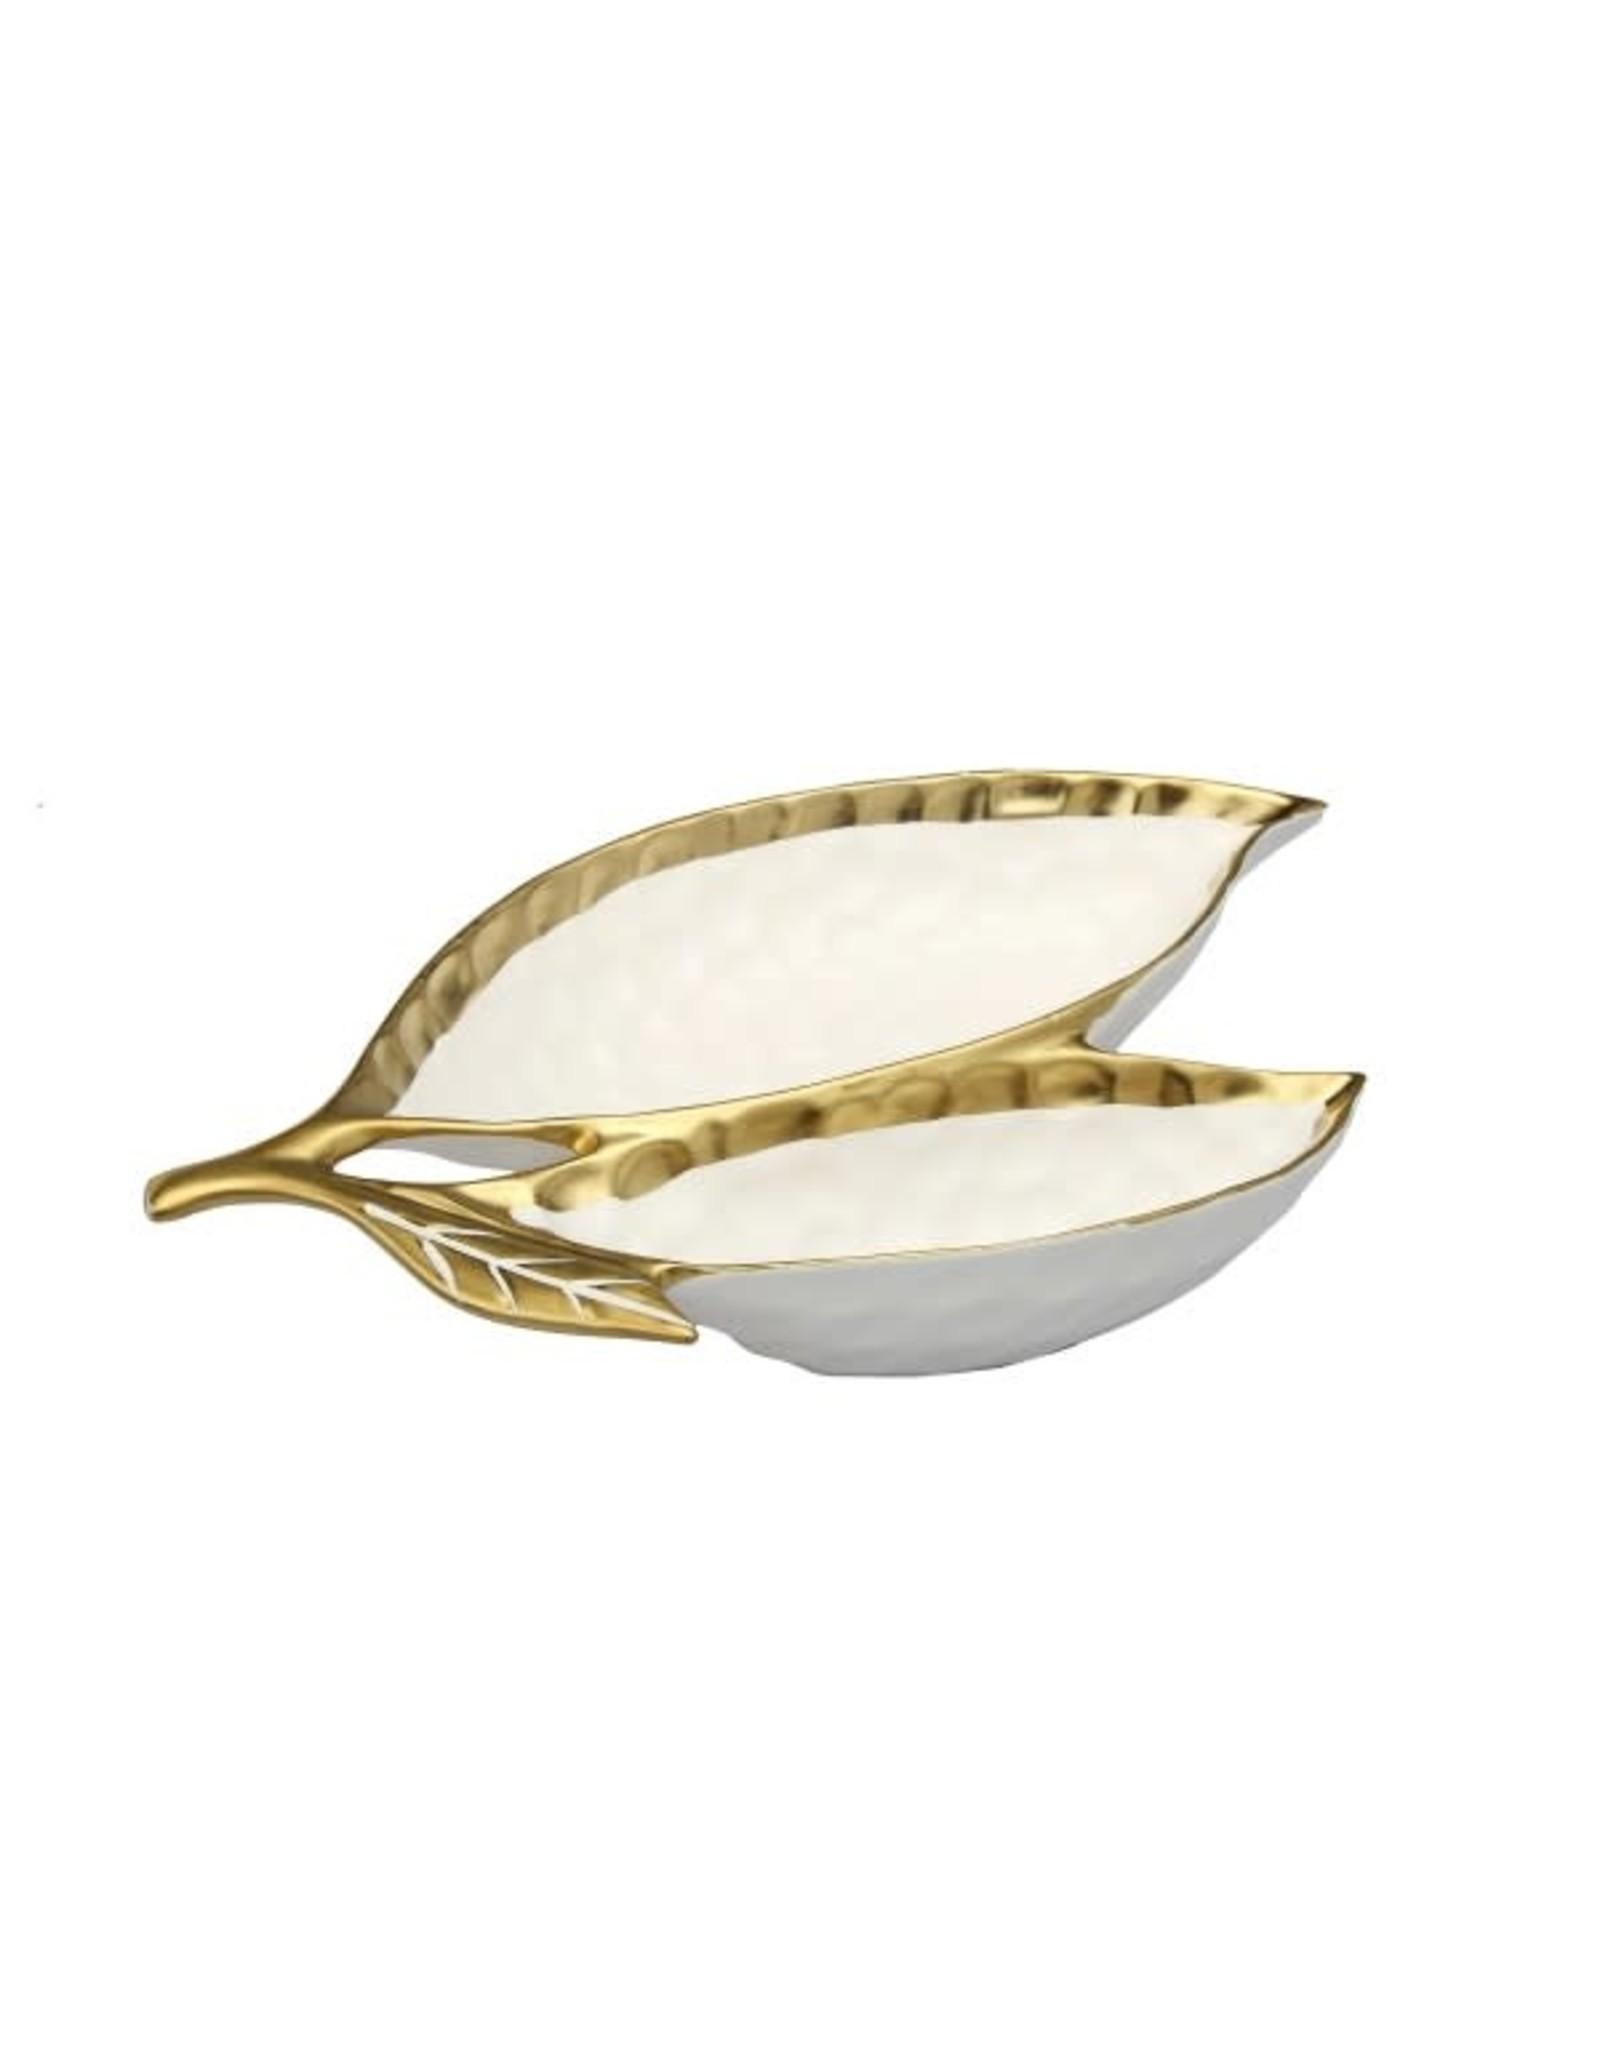 "WPL560 White Porcelain Leaf Relish Dish with Gold Rim - 15""L x 8.75""W x 2.25""H"